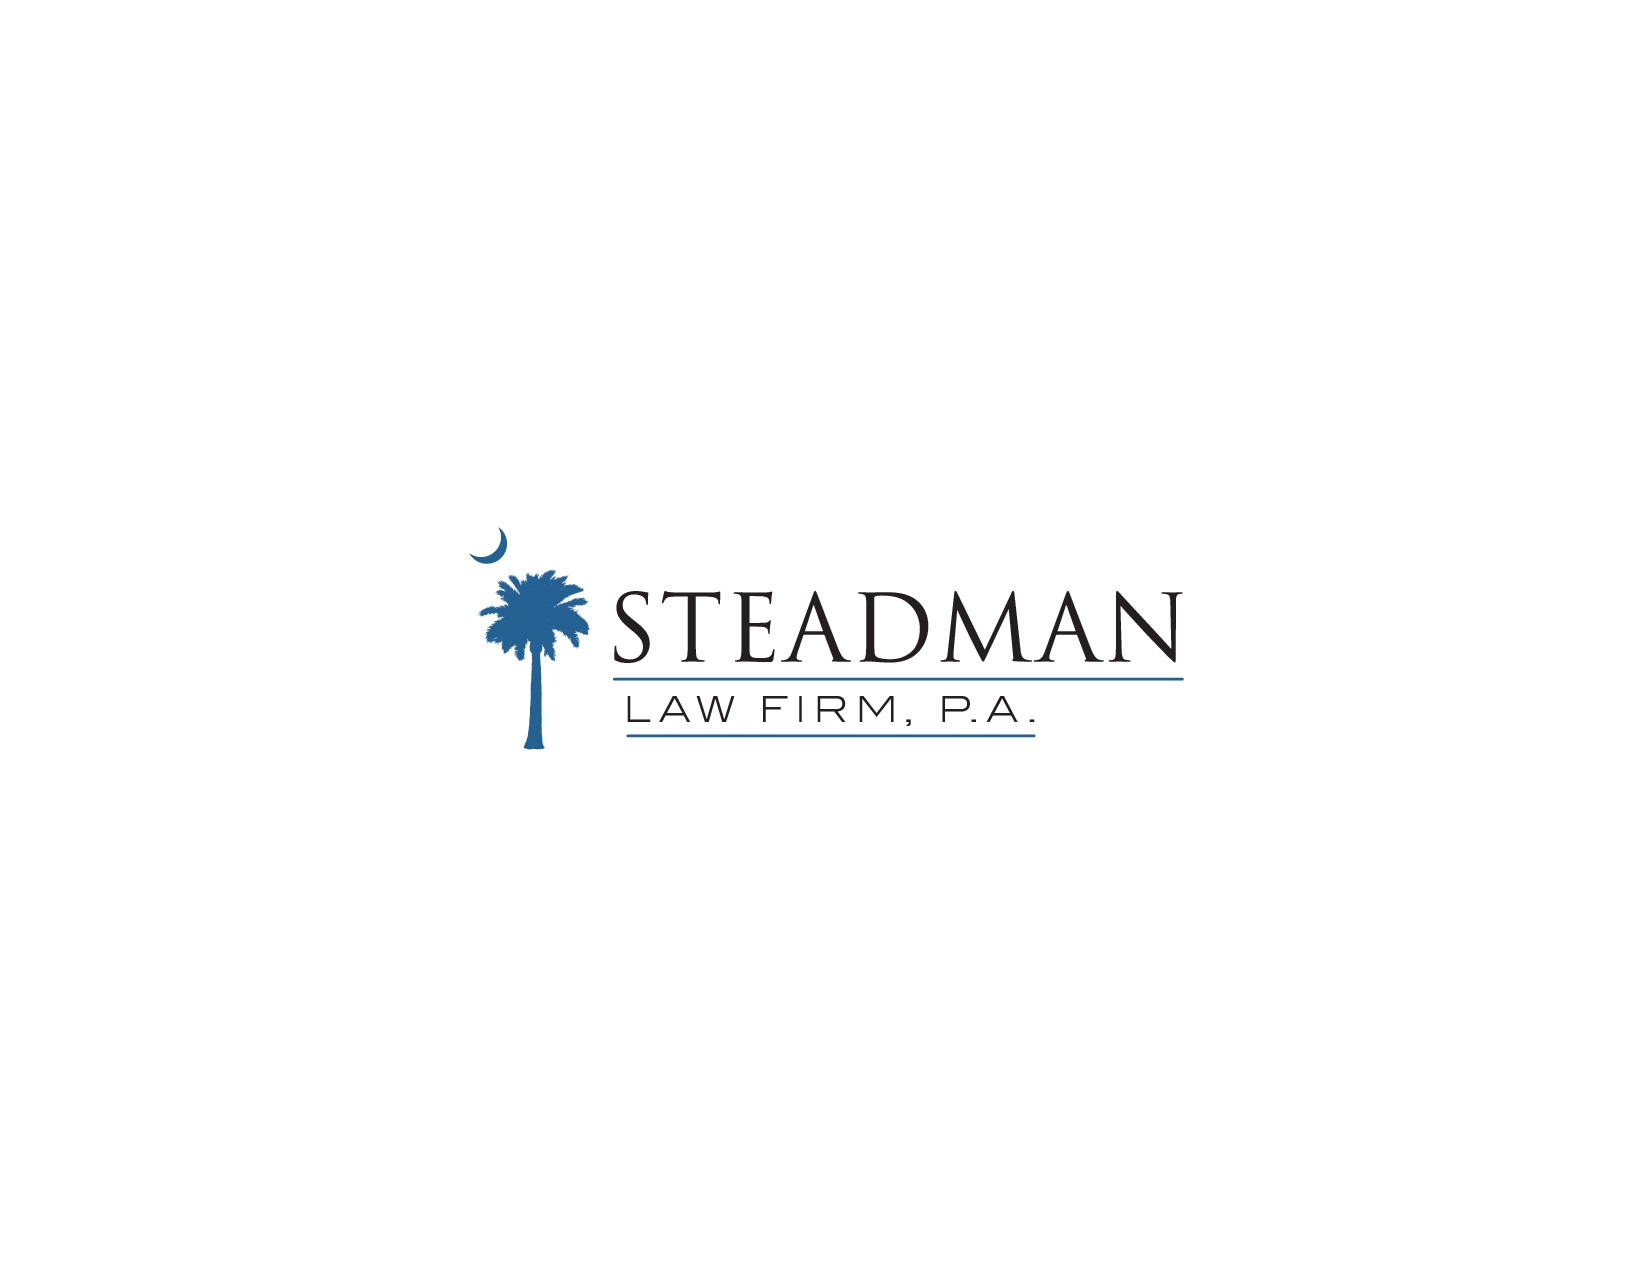 Steadman Law needs a Logo